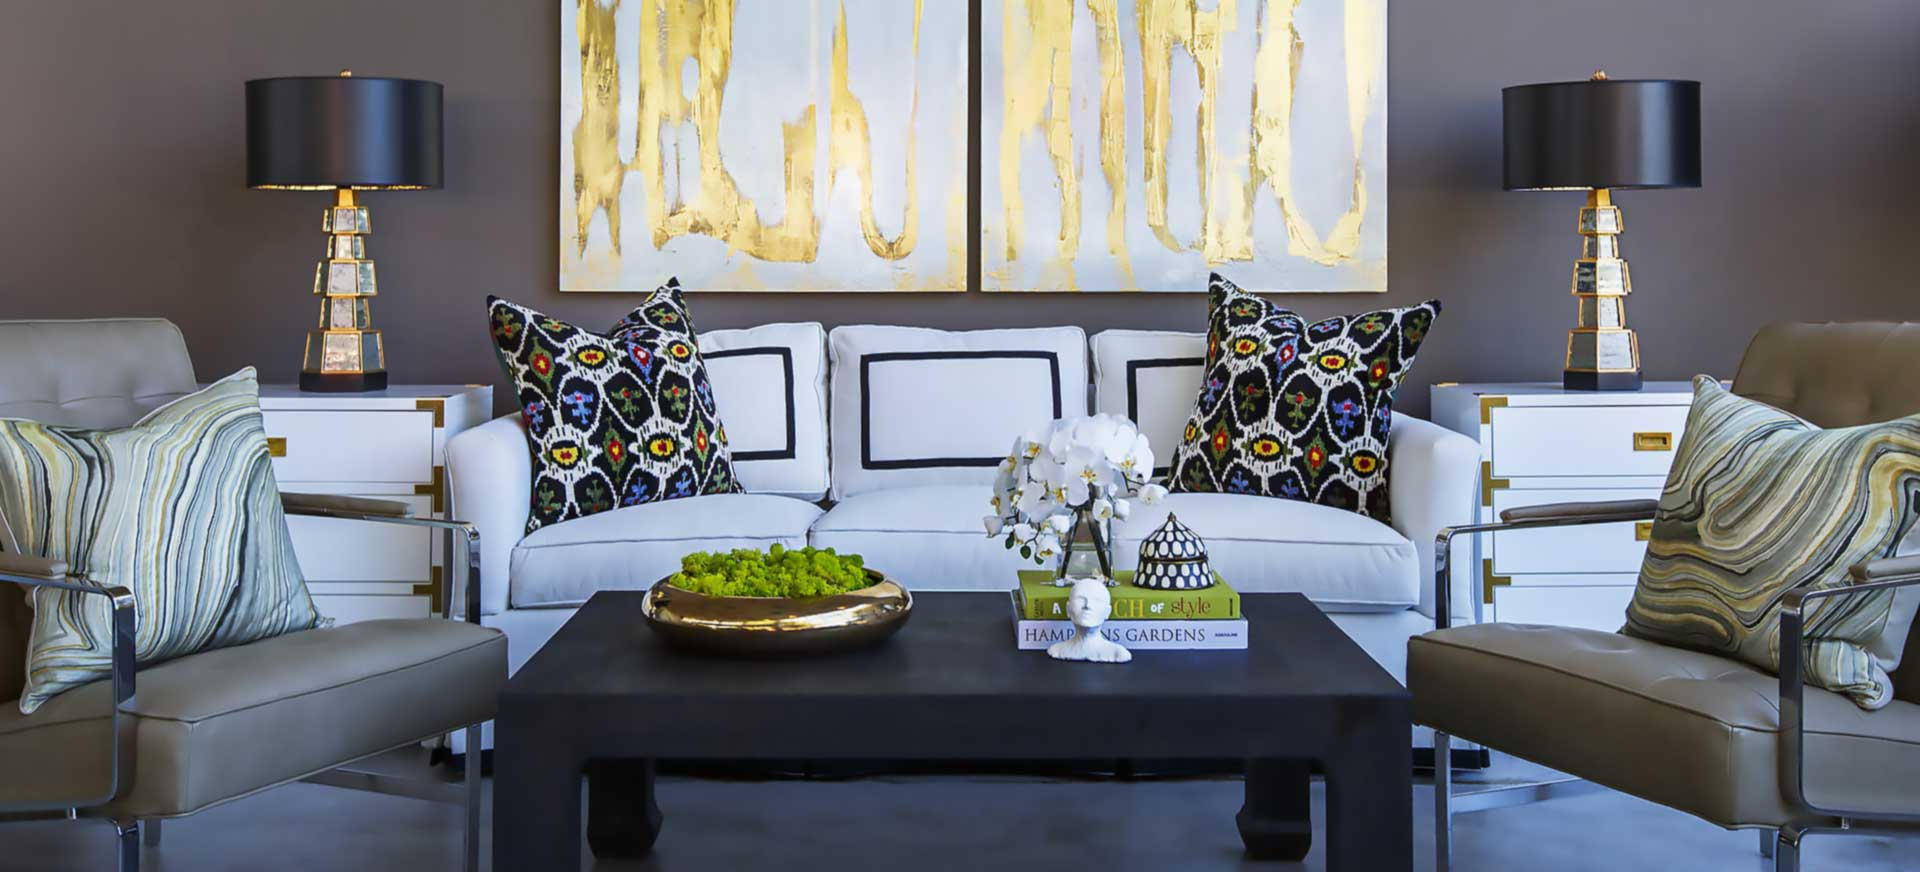 Babcock furniture jacksonville fl 100 grosfillex bahia for Home decor jacksonville fl